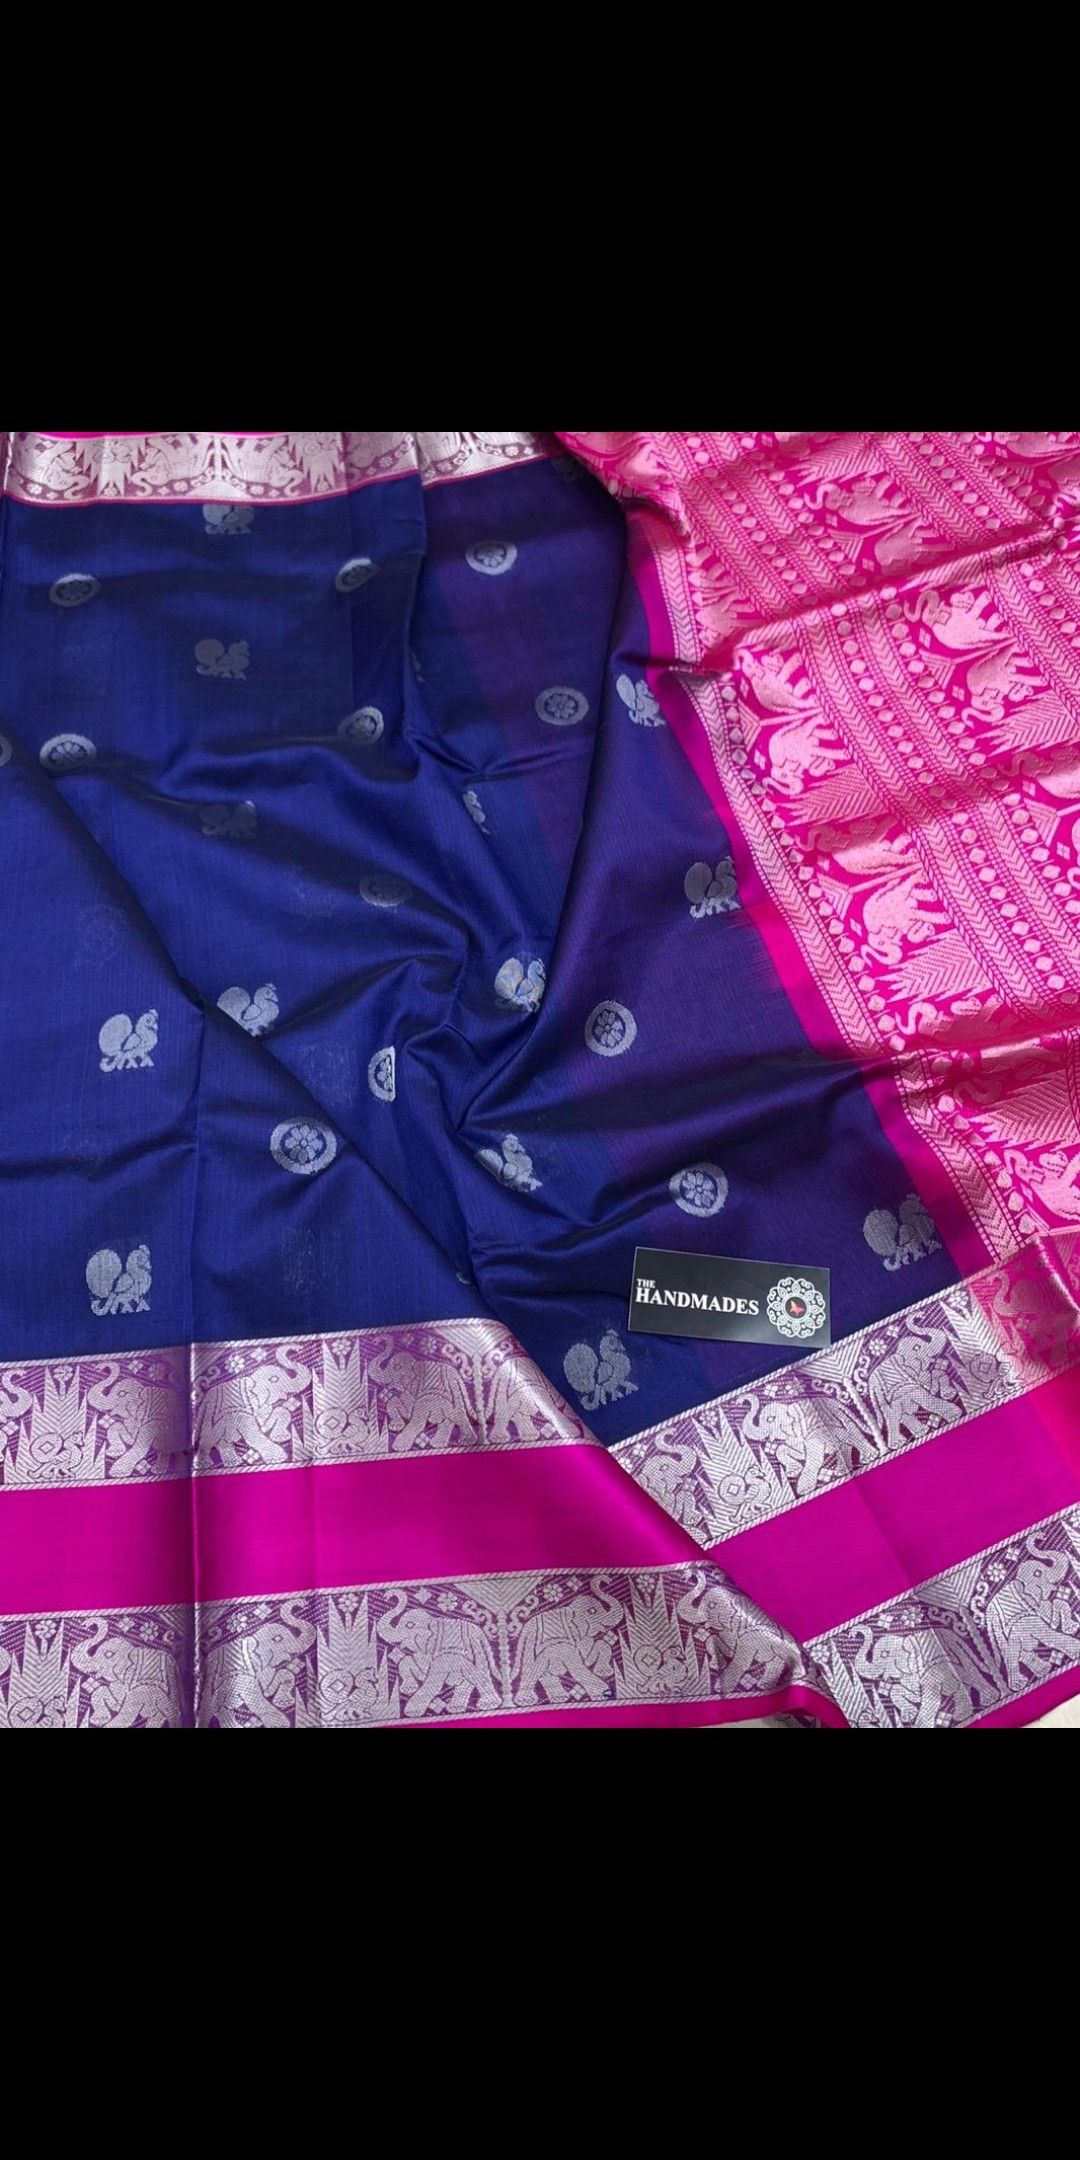 b5473411e5832 Latest Kuppadam Silk Sarees with Silver gold Jari Borders   Buttas    Contrast Rich Pallu   Contrast Plain Blouse   Price - 7600+⛵